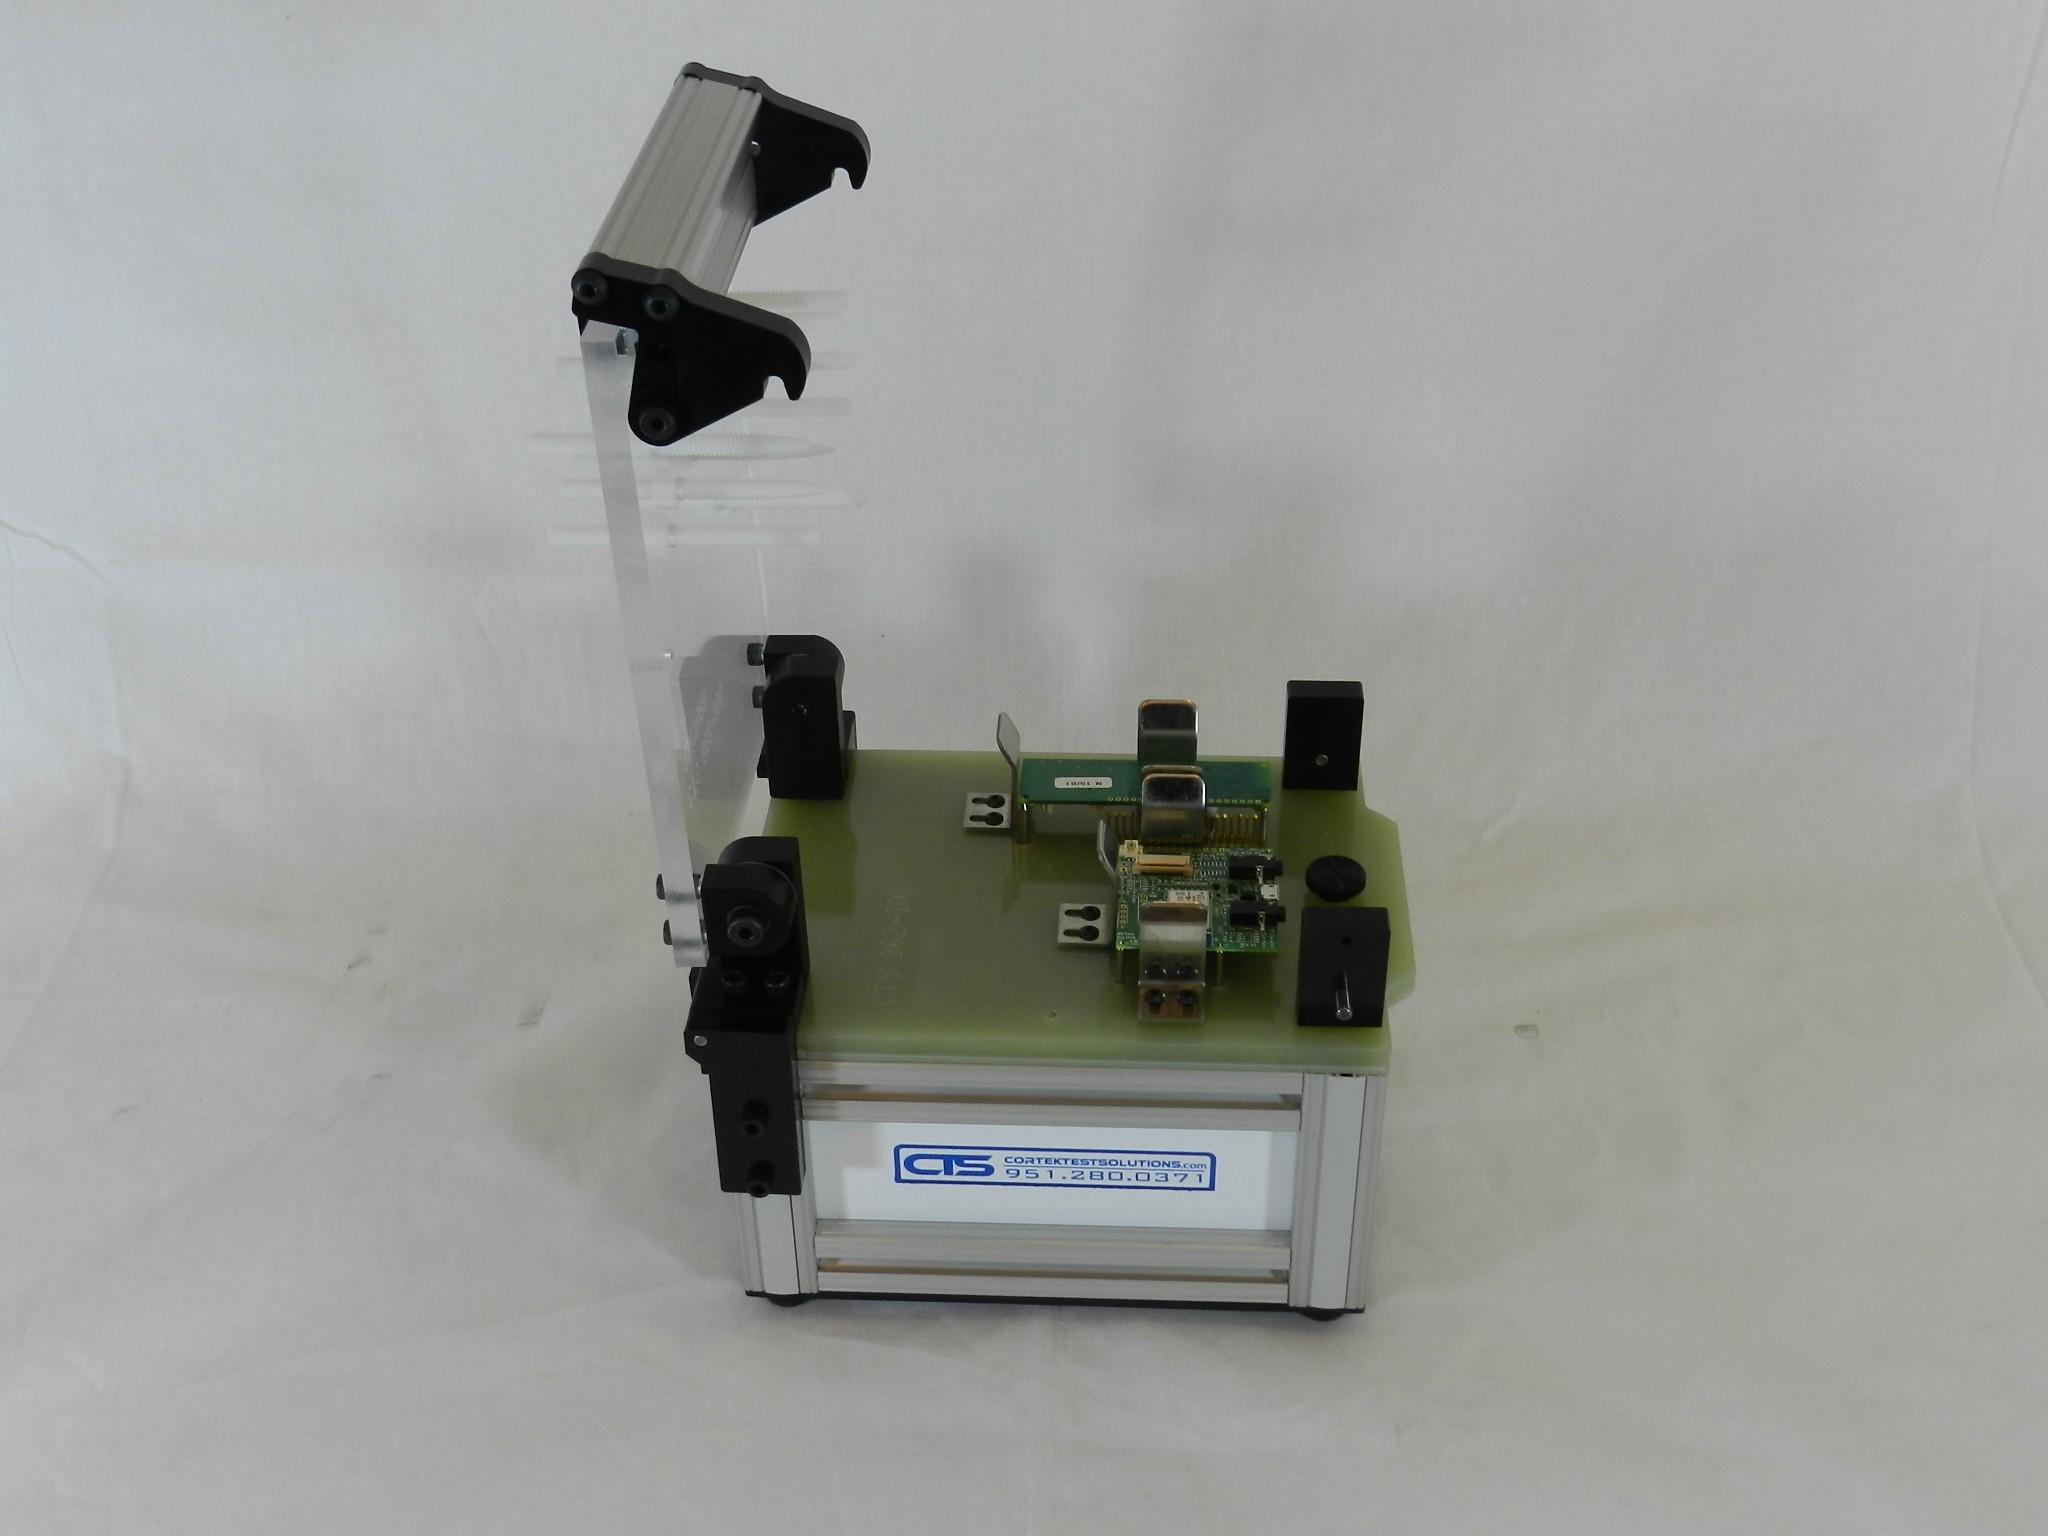 Testing printed circuit boards